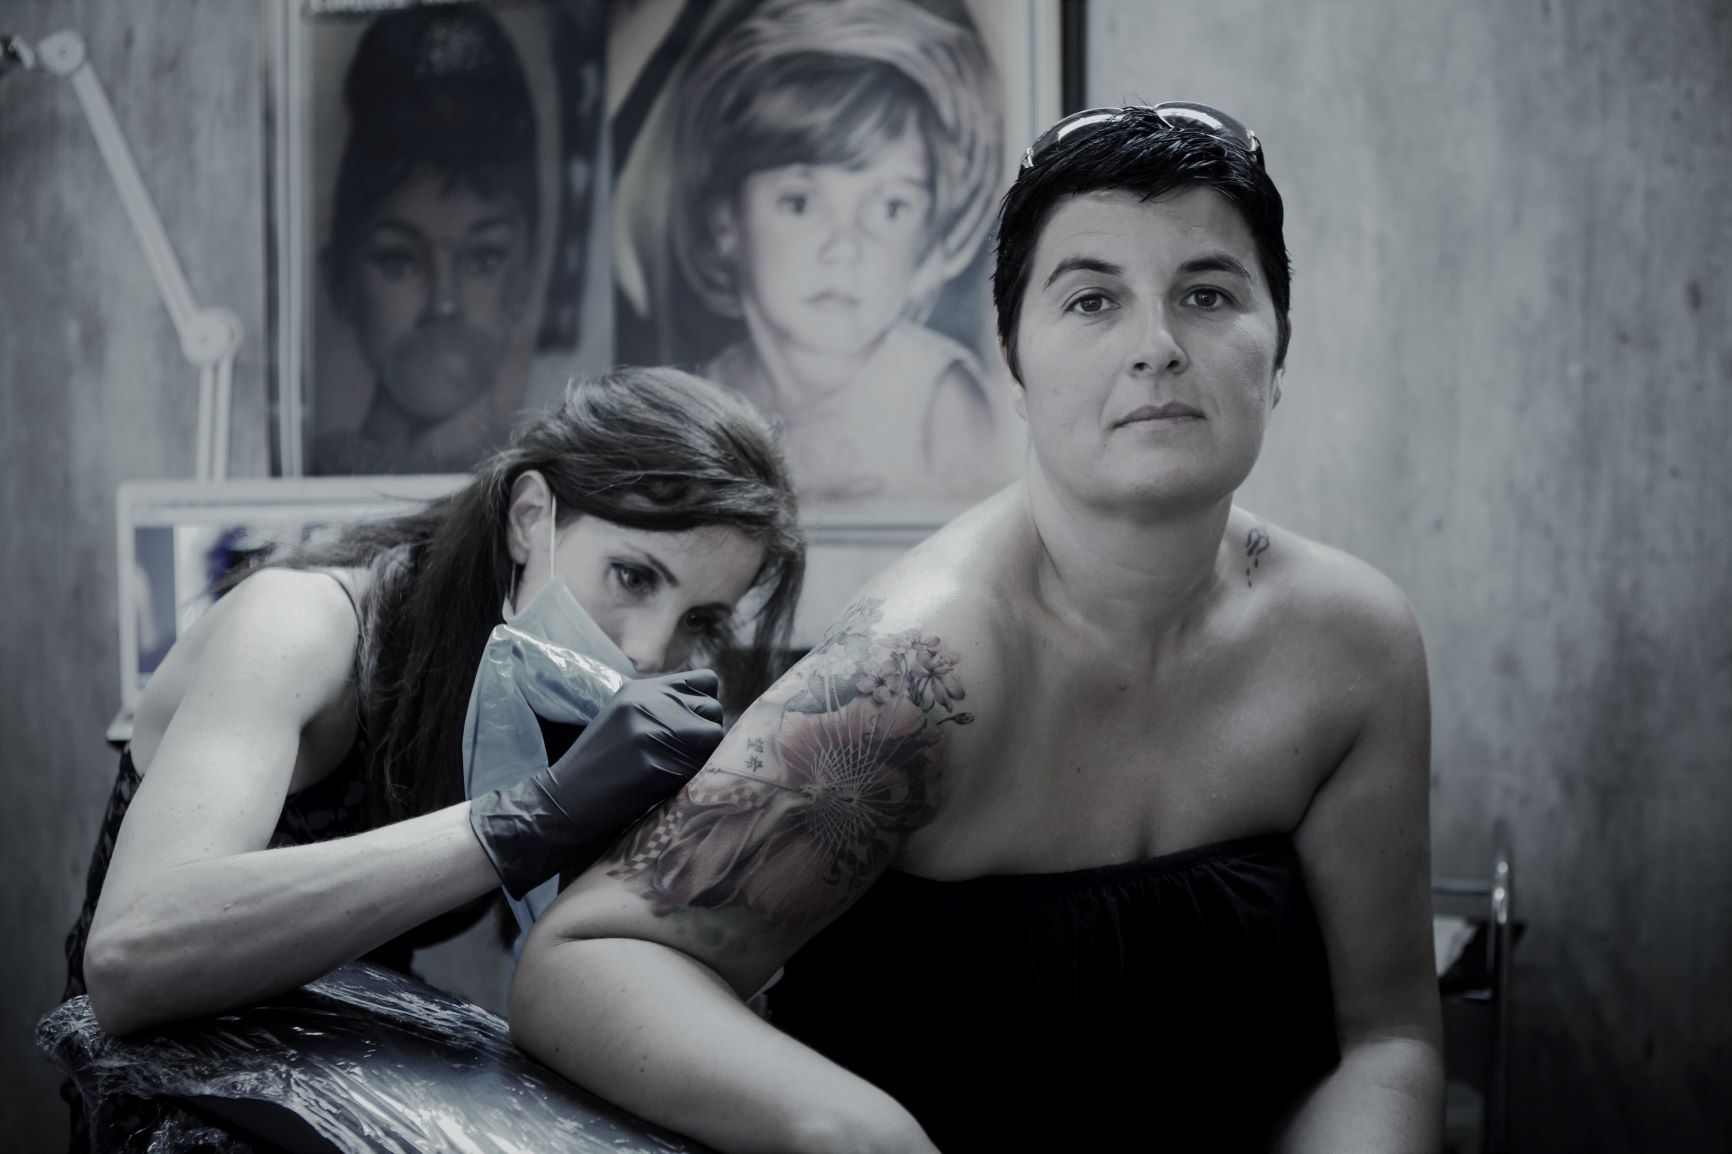 tatouage-partage-tatoueur-covid-19-confinement-coronavirus-snat